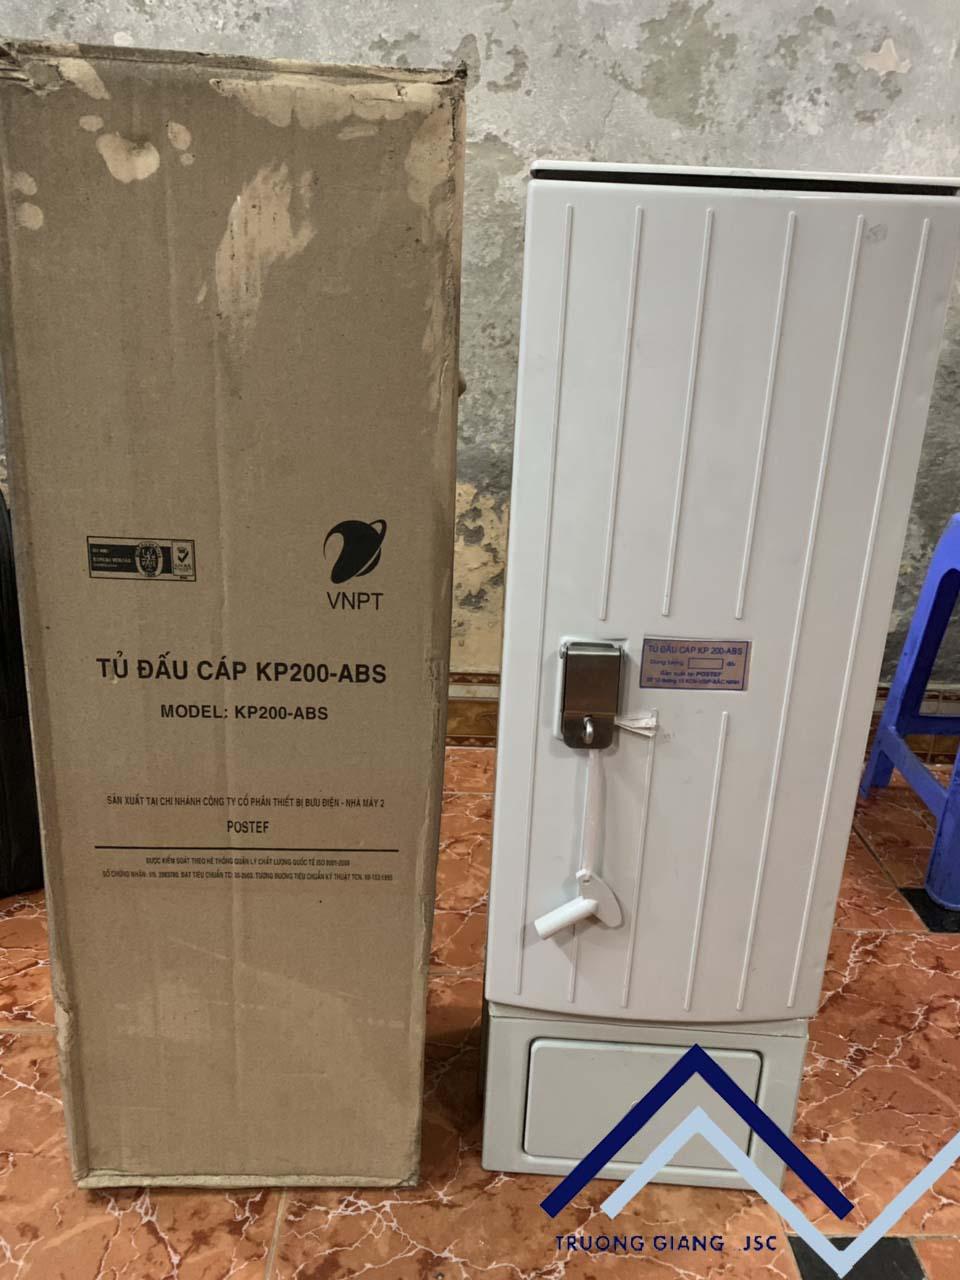 Vỏ tủ kp 200 Abs postef